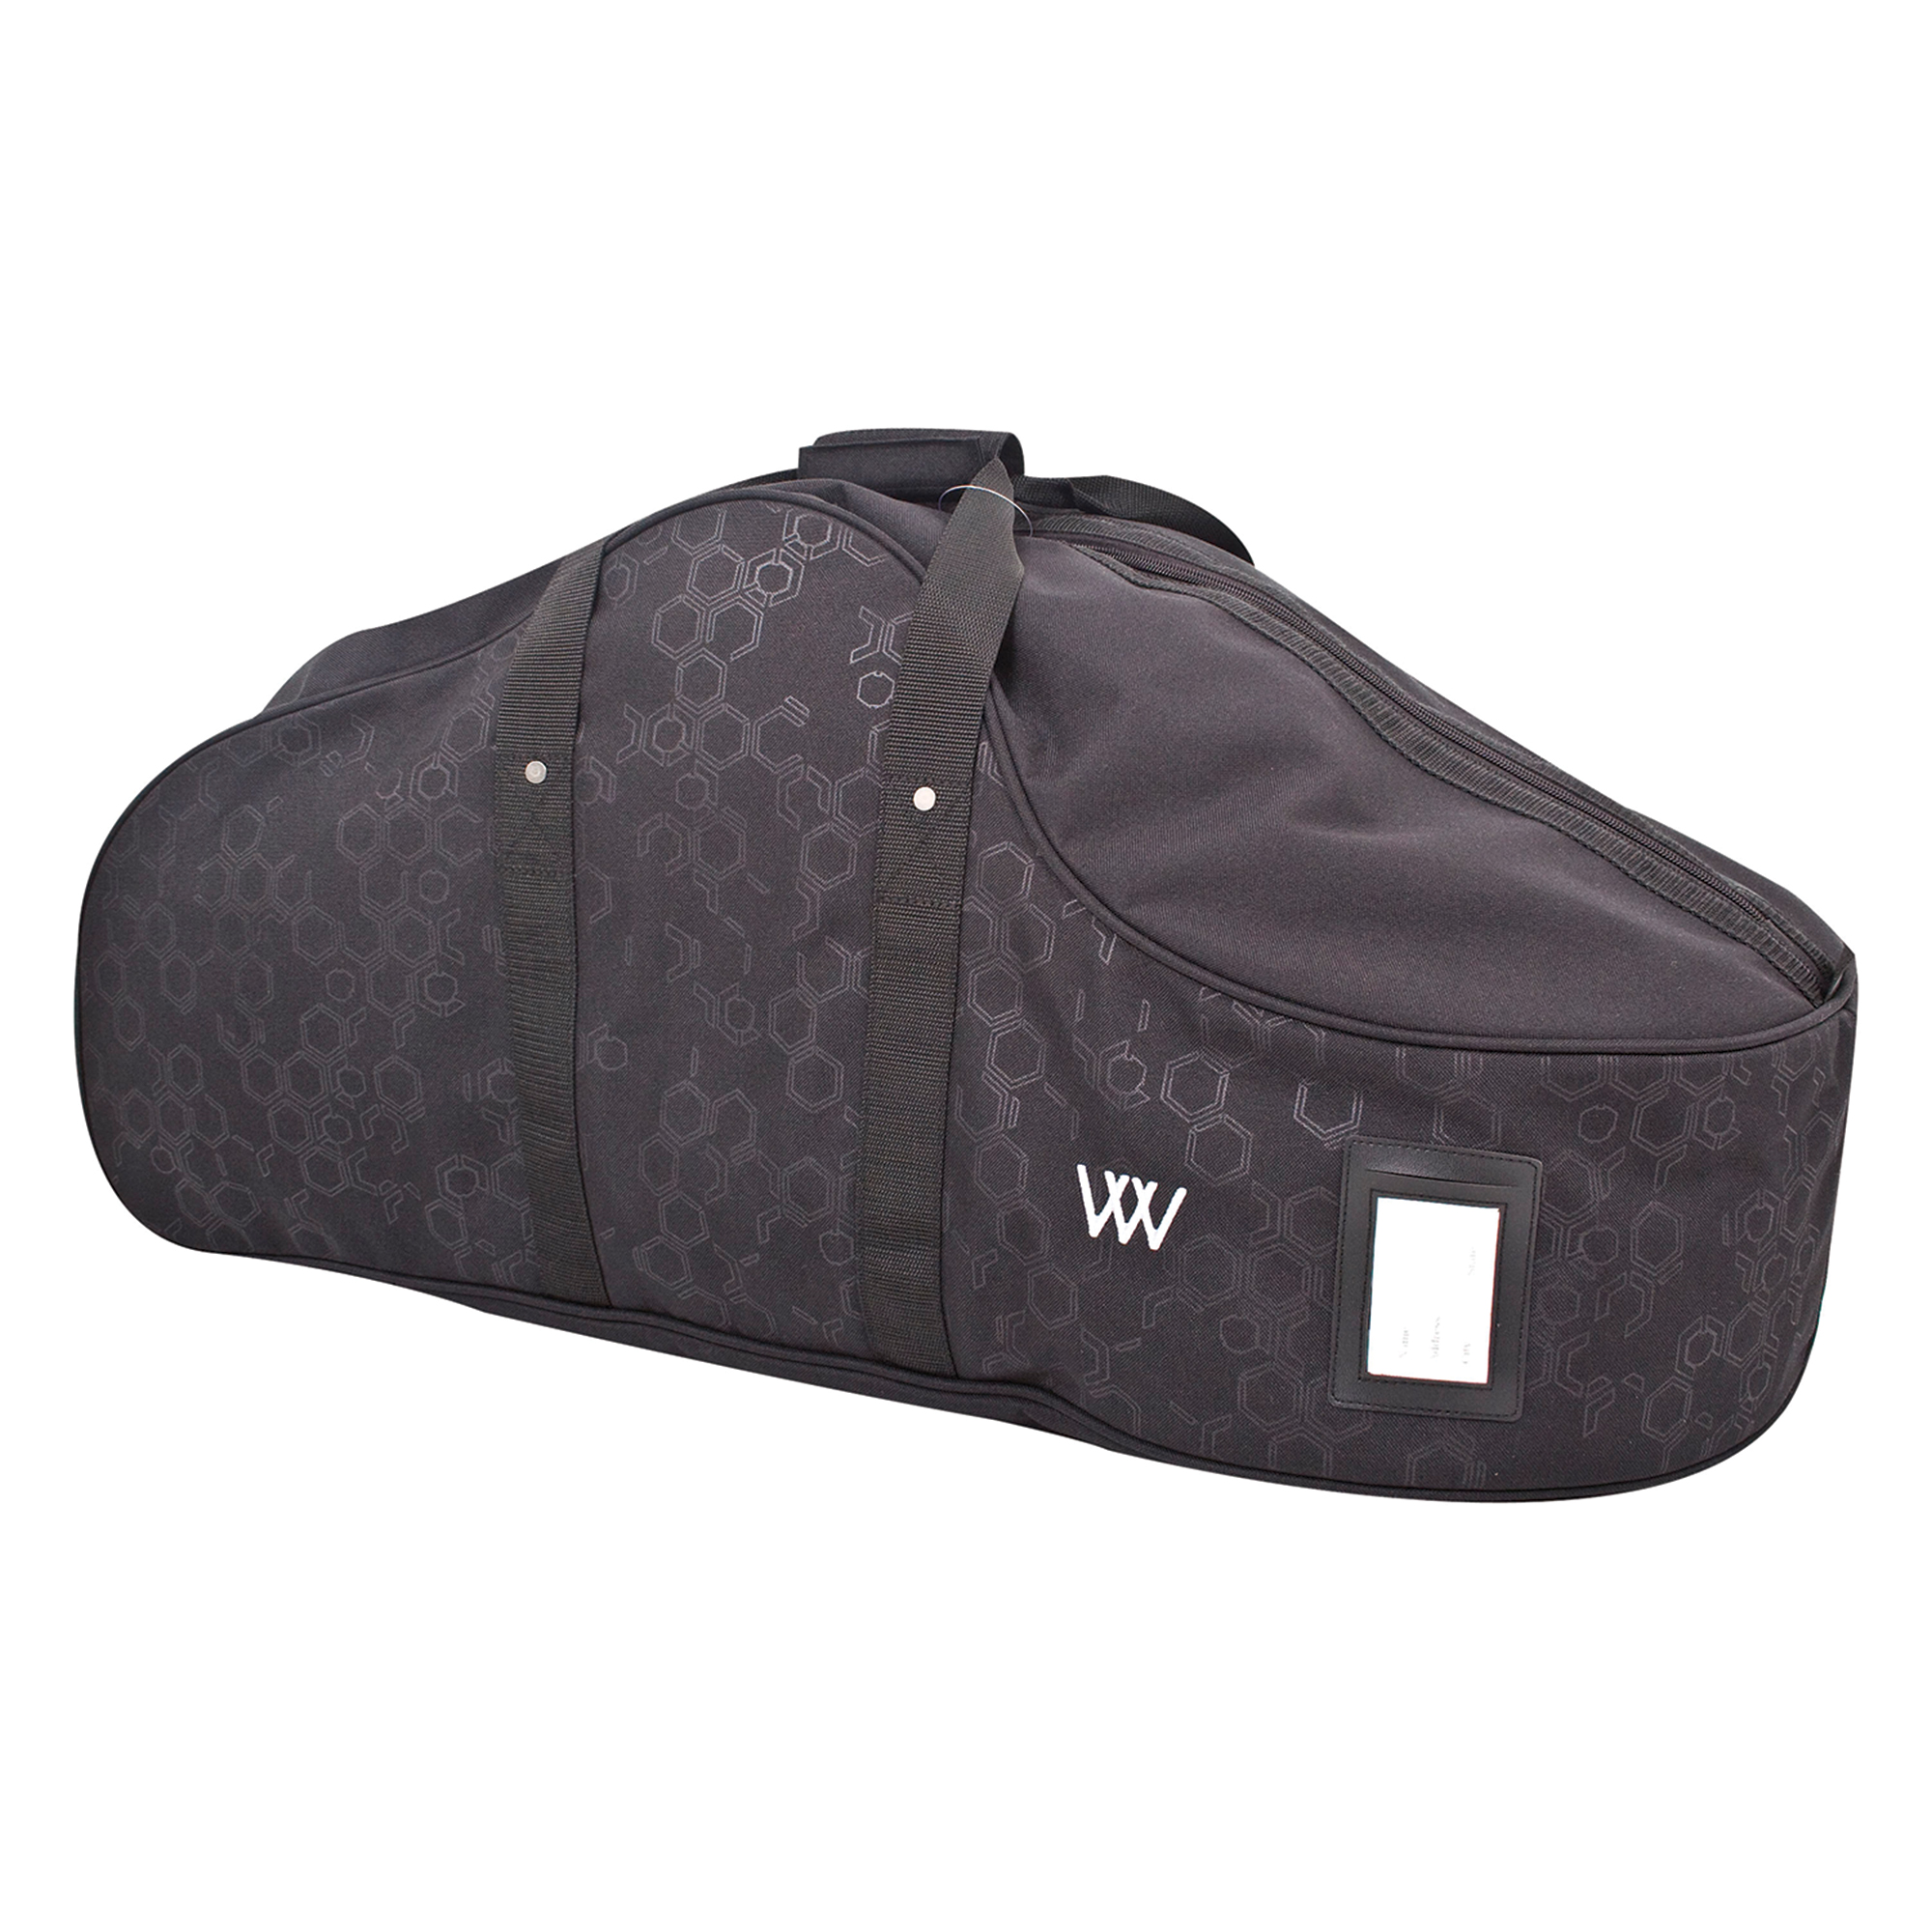 Woof Saddle Bag